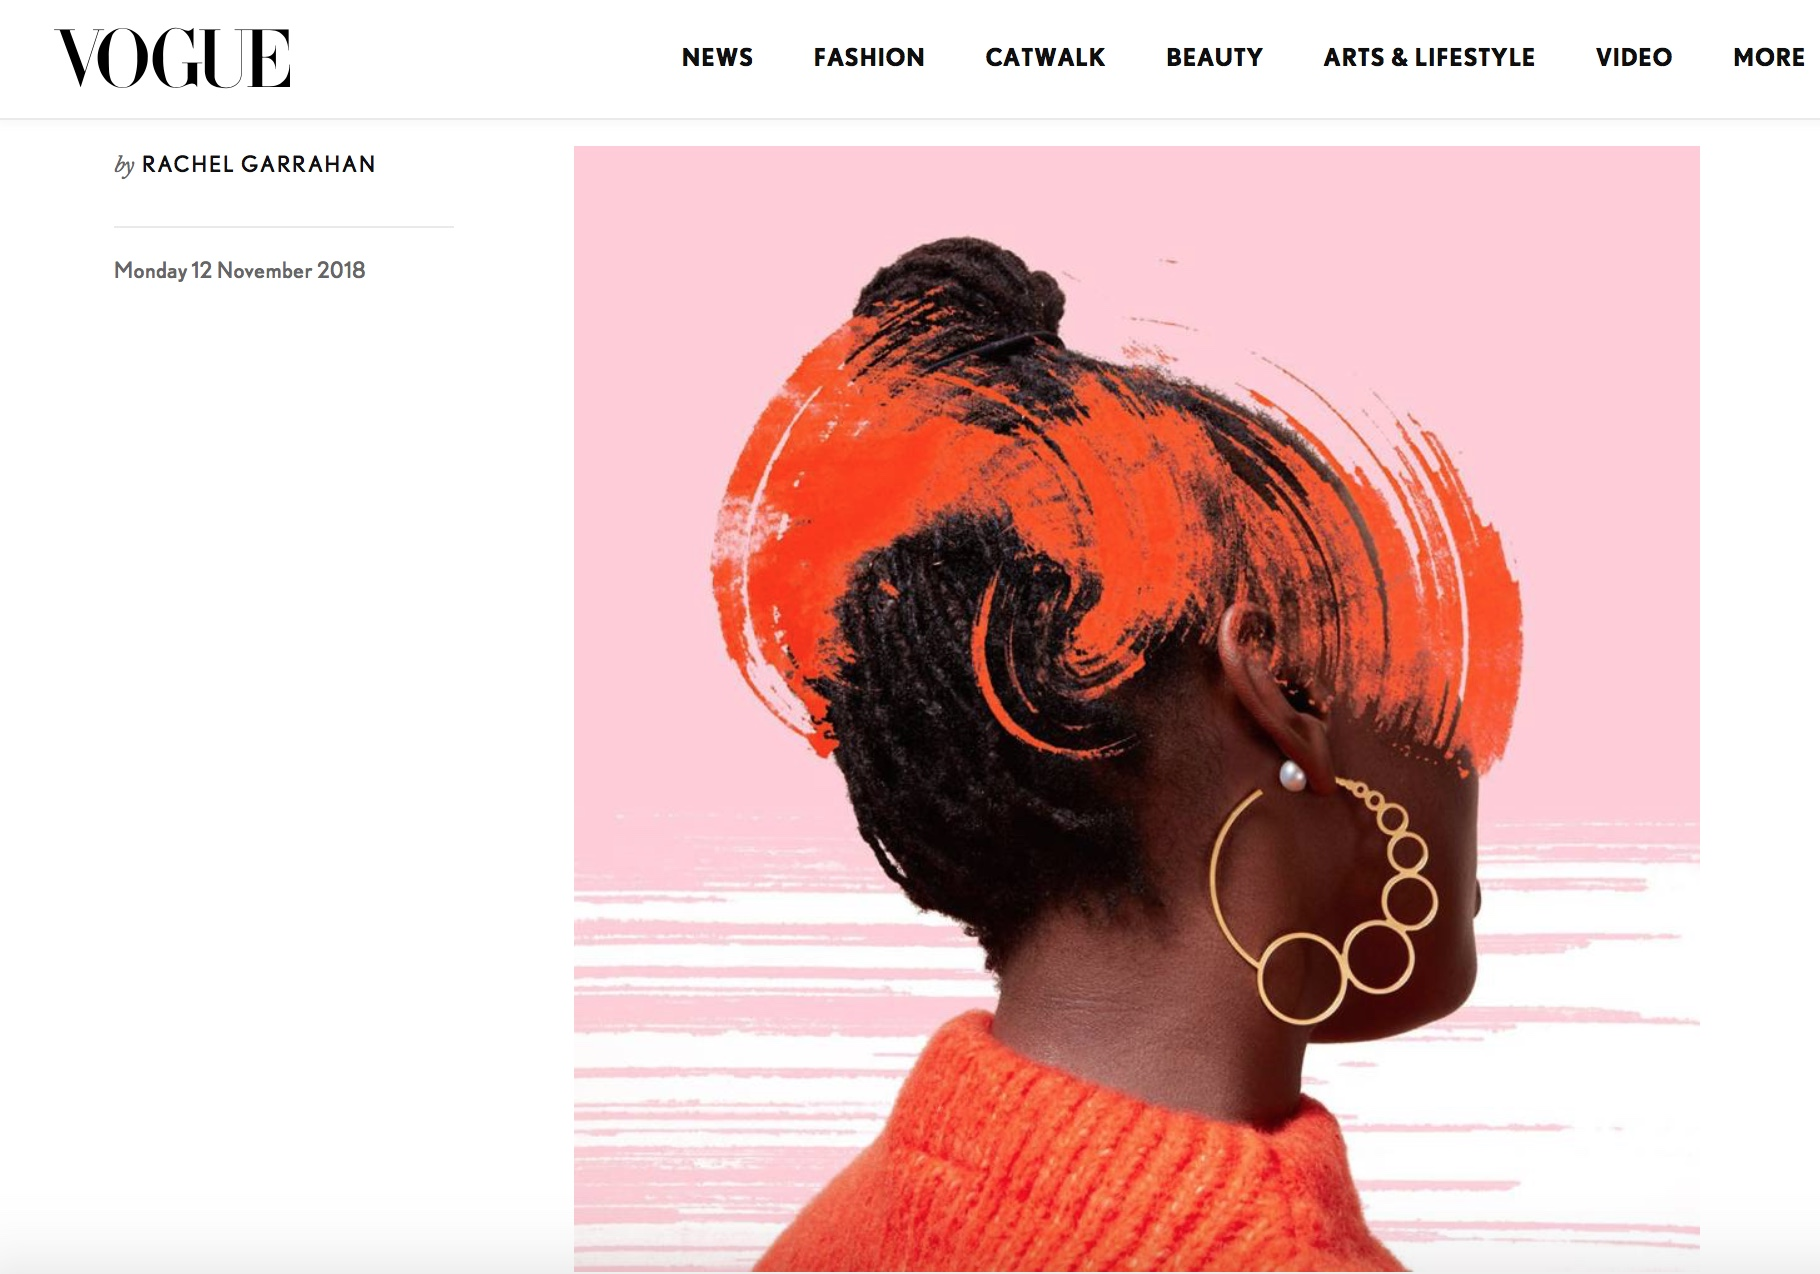 Bubble Earrings: Vogue, November 2018, Motley London & Sian Evans collaboration. Read the article  here